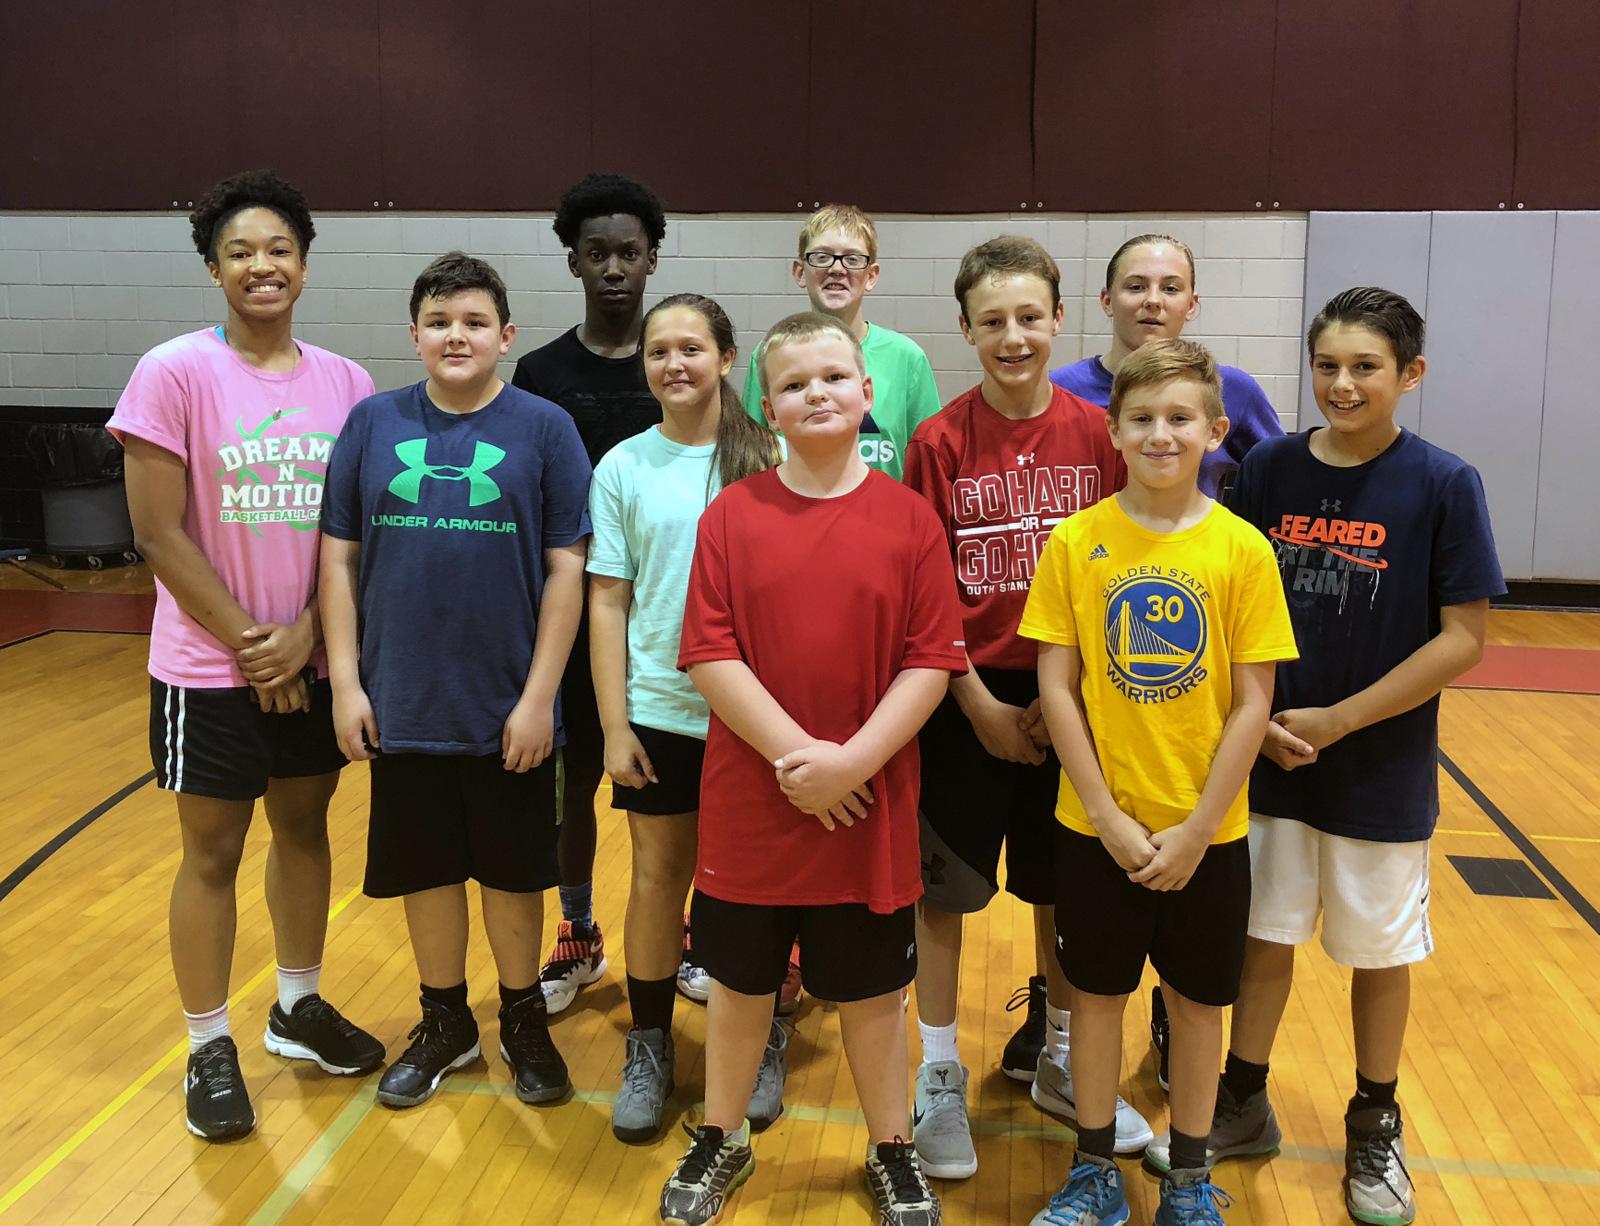 Dreams N Motion Basketball Camp